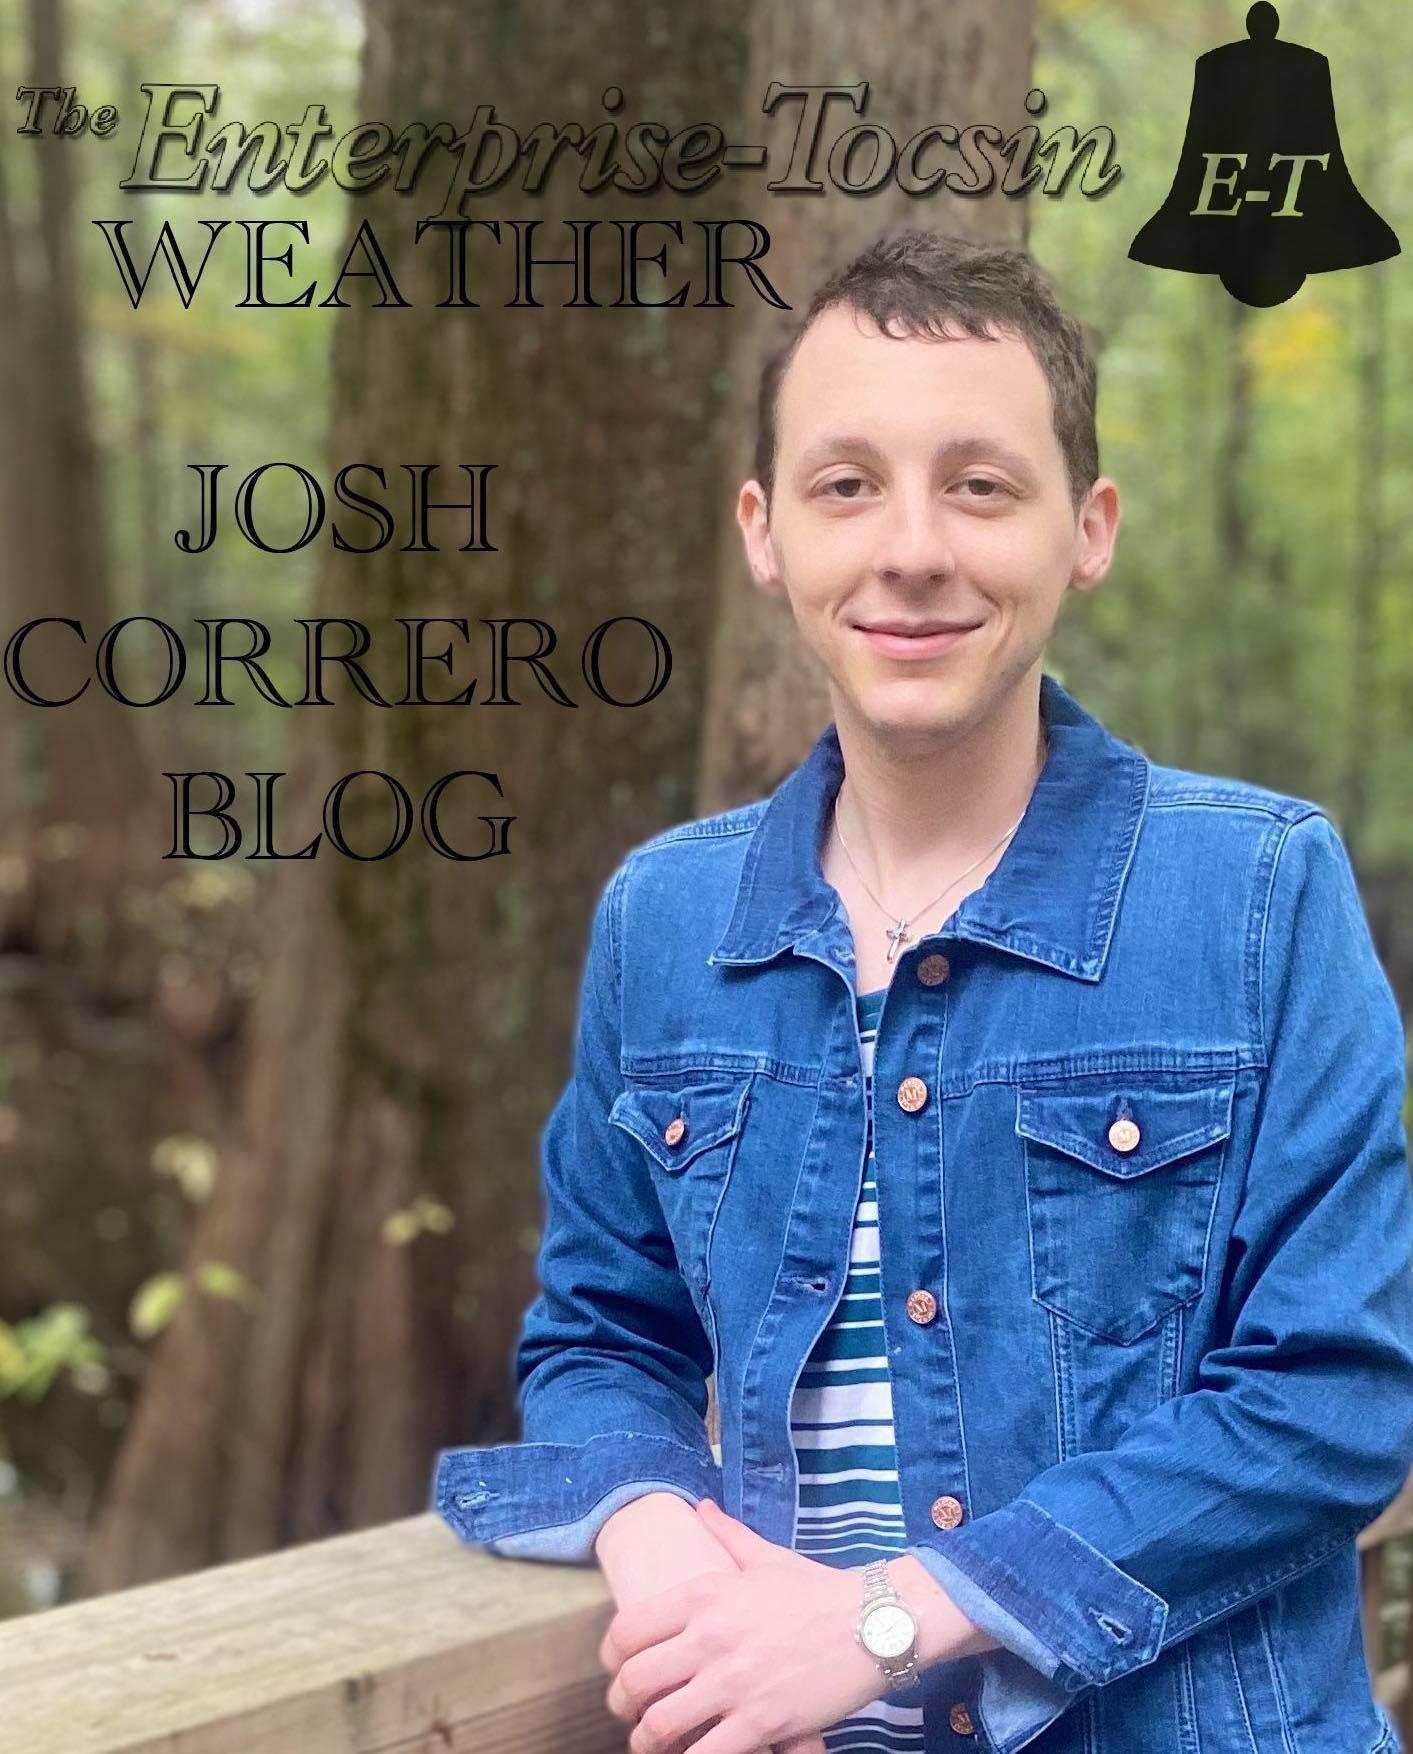 Josh Correro